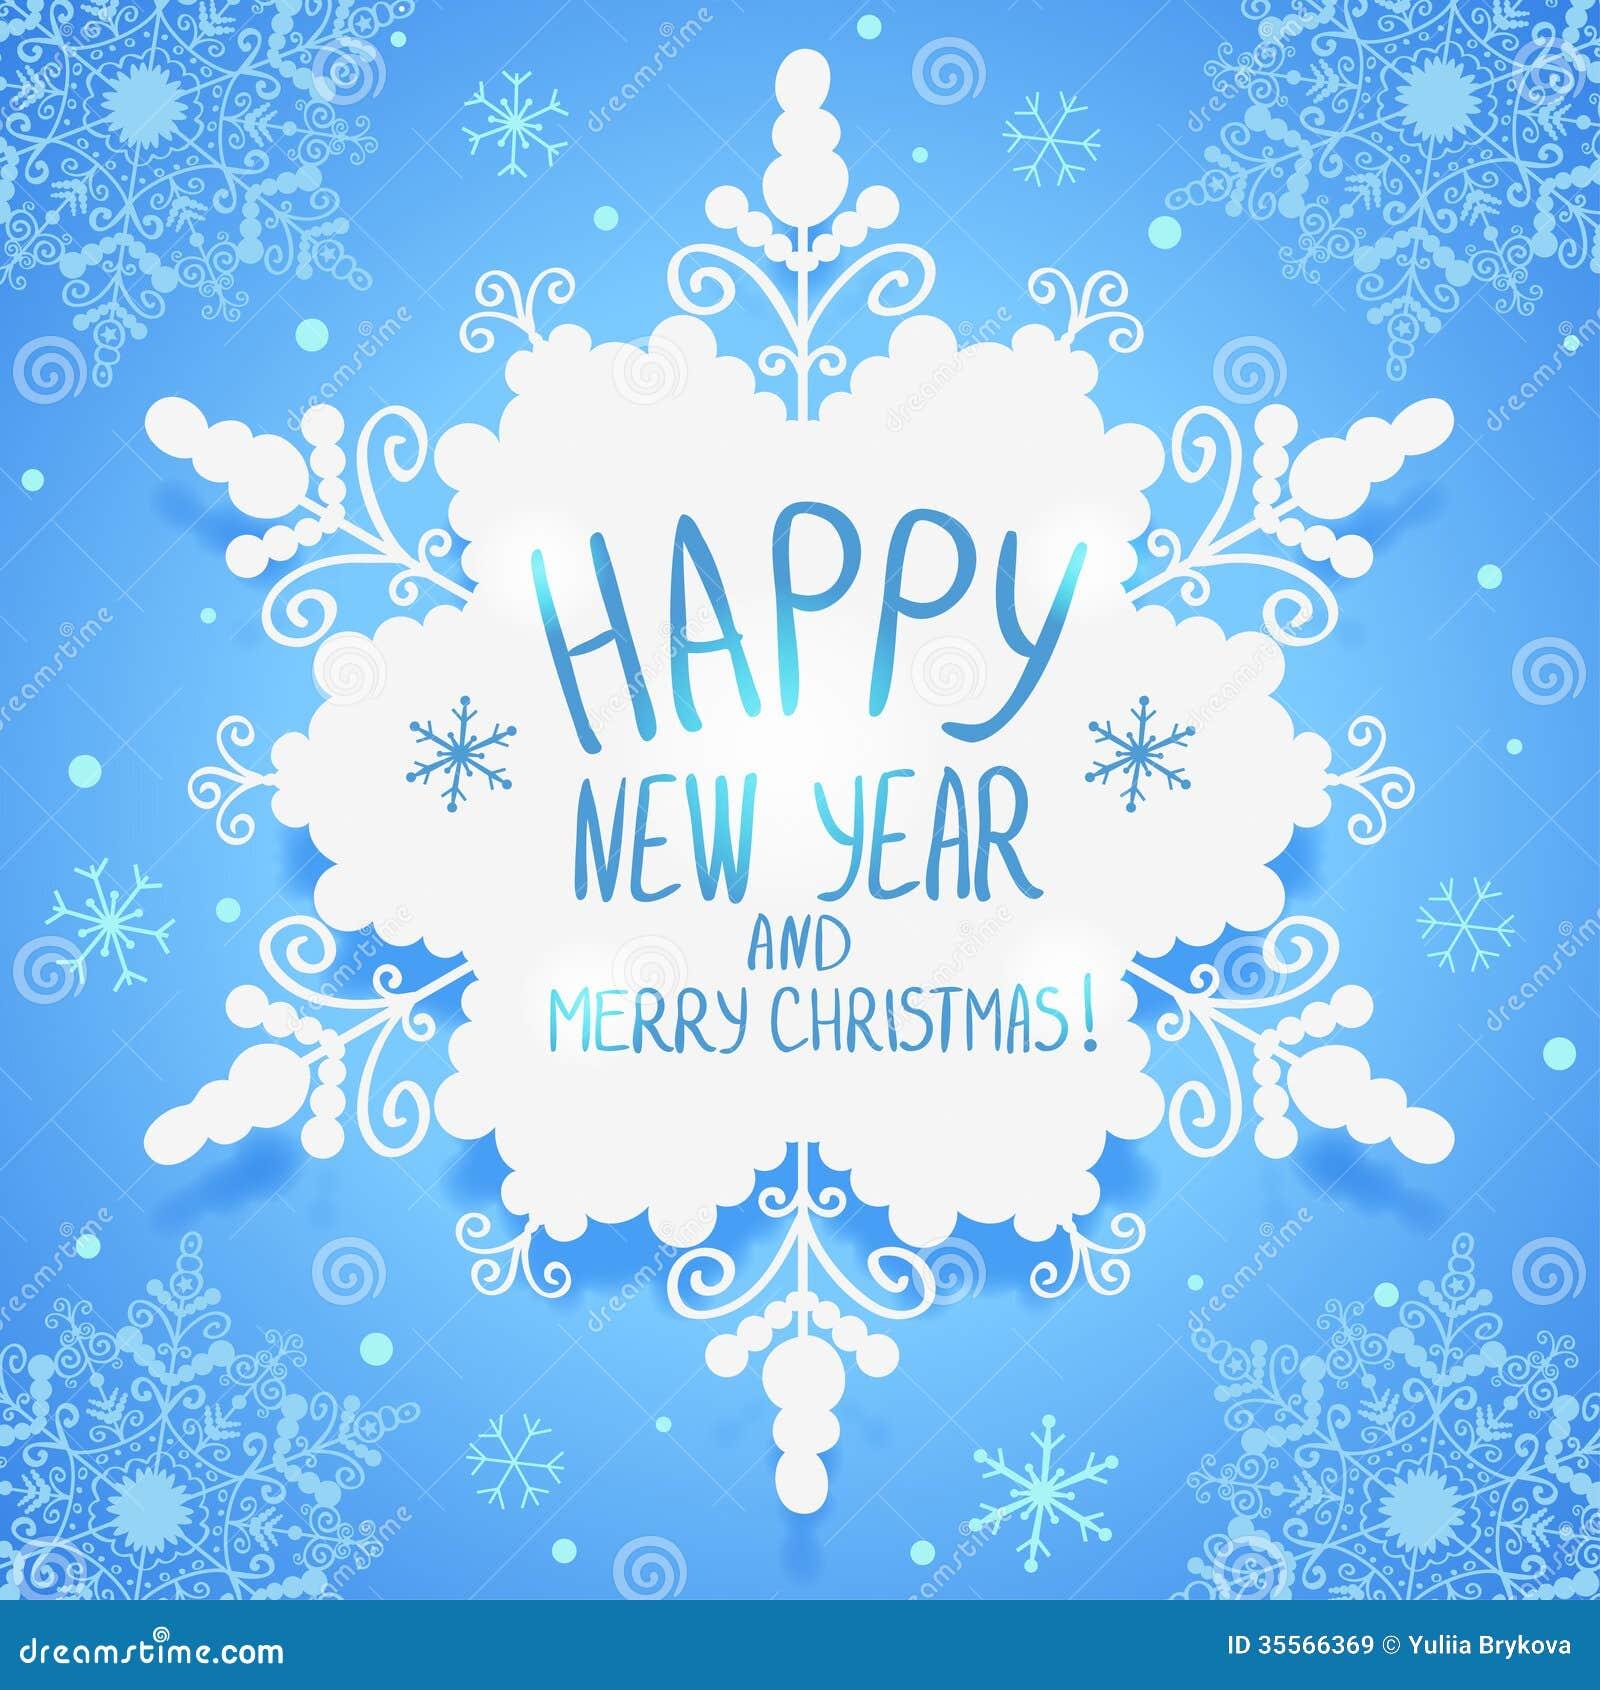 Snowflake wallpaper beautiful design snowflakes text christmas new